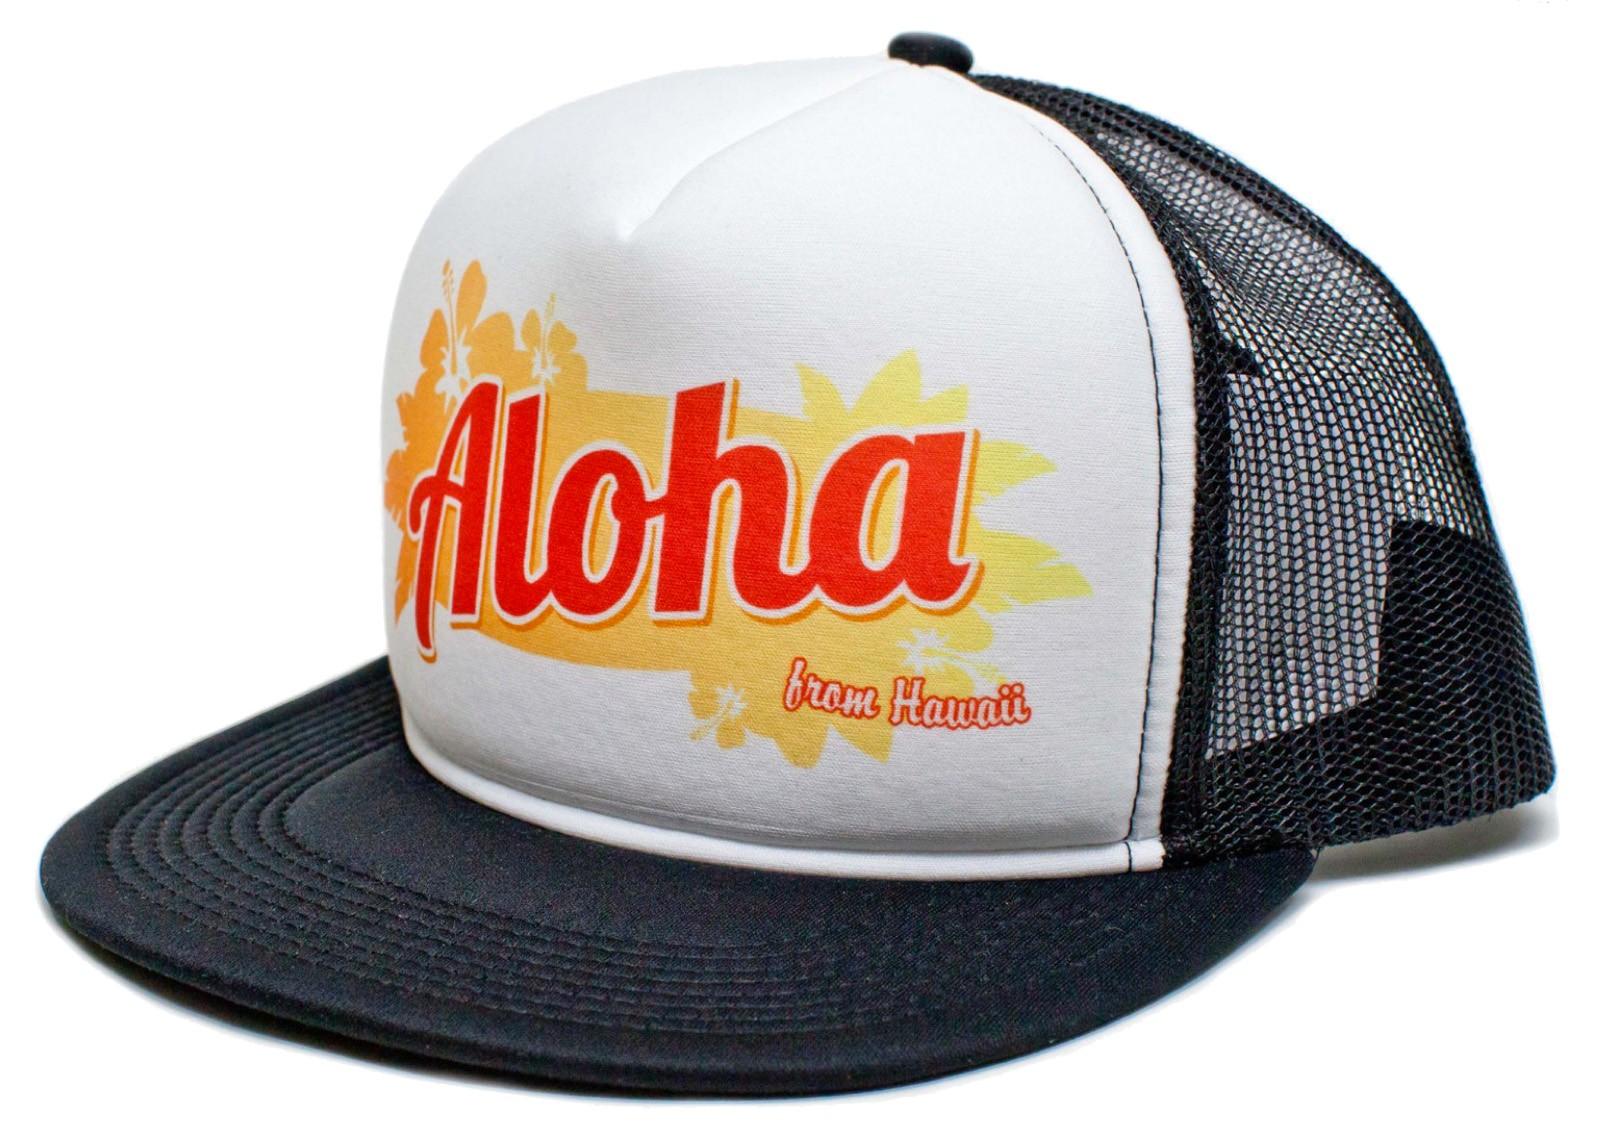 Retro Cap - Aloha from Hawaii Cap